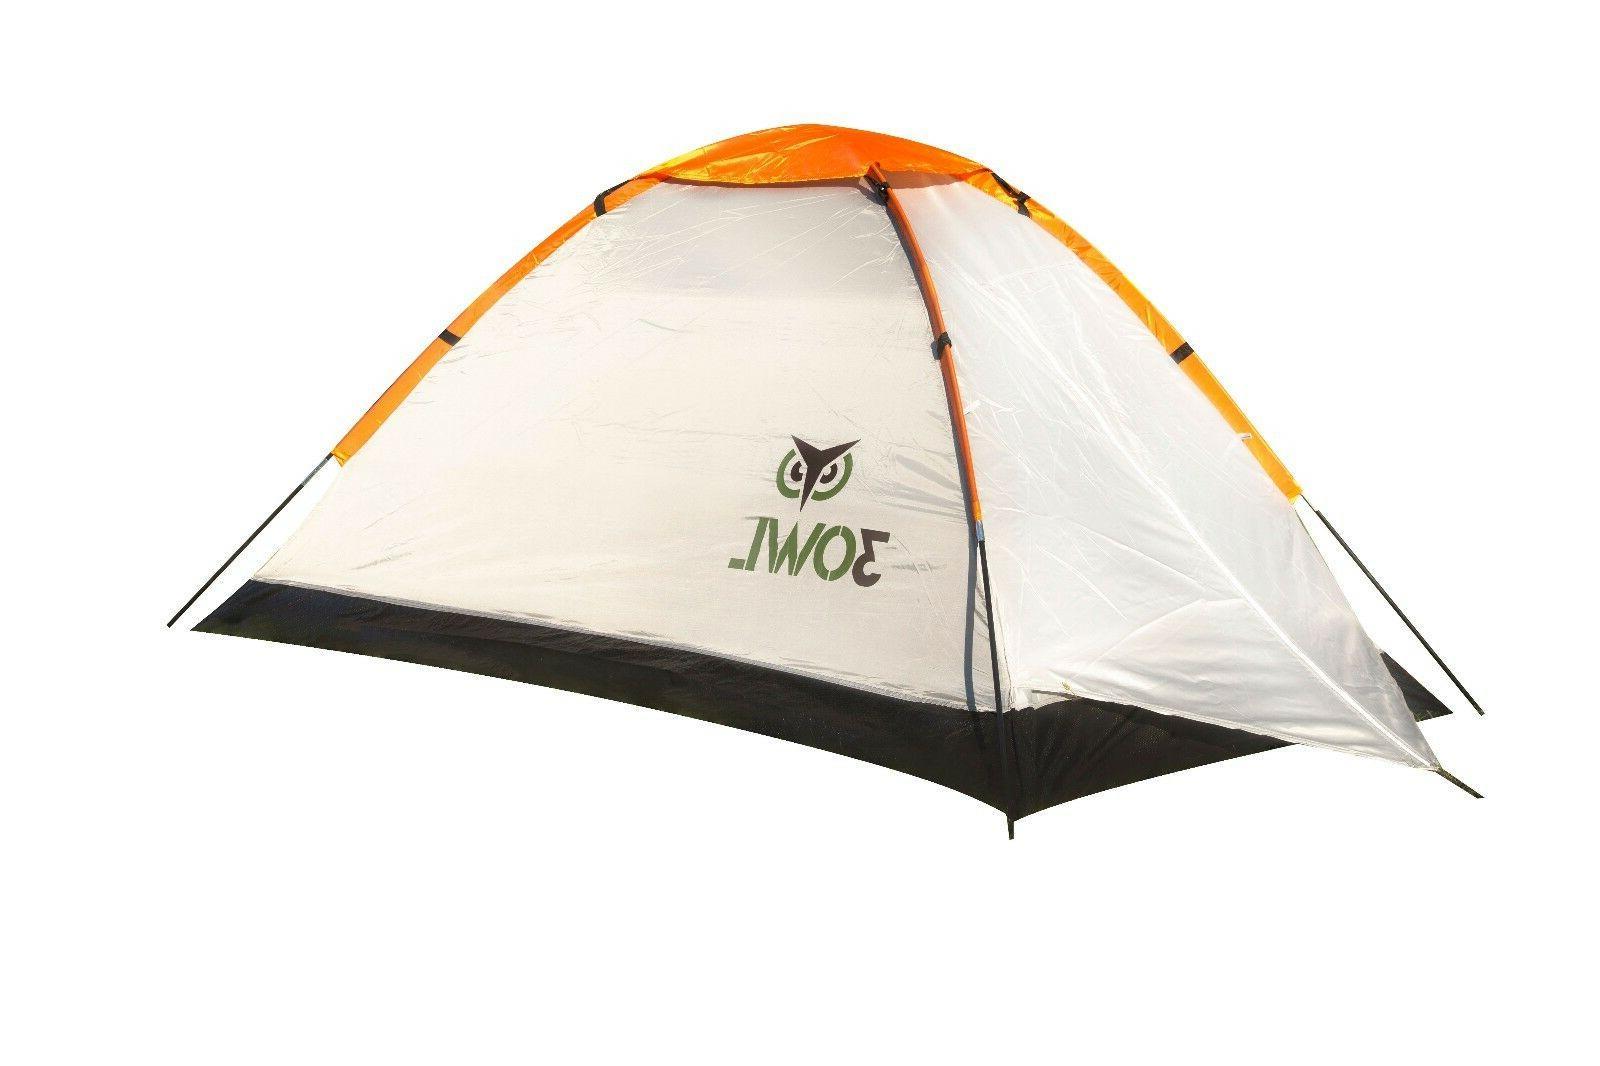 everglades 2 person tent with vestibule perfect